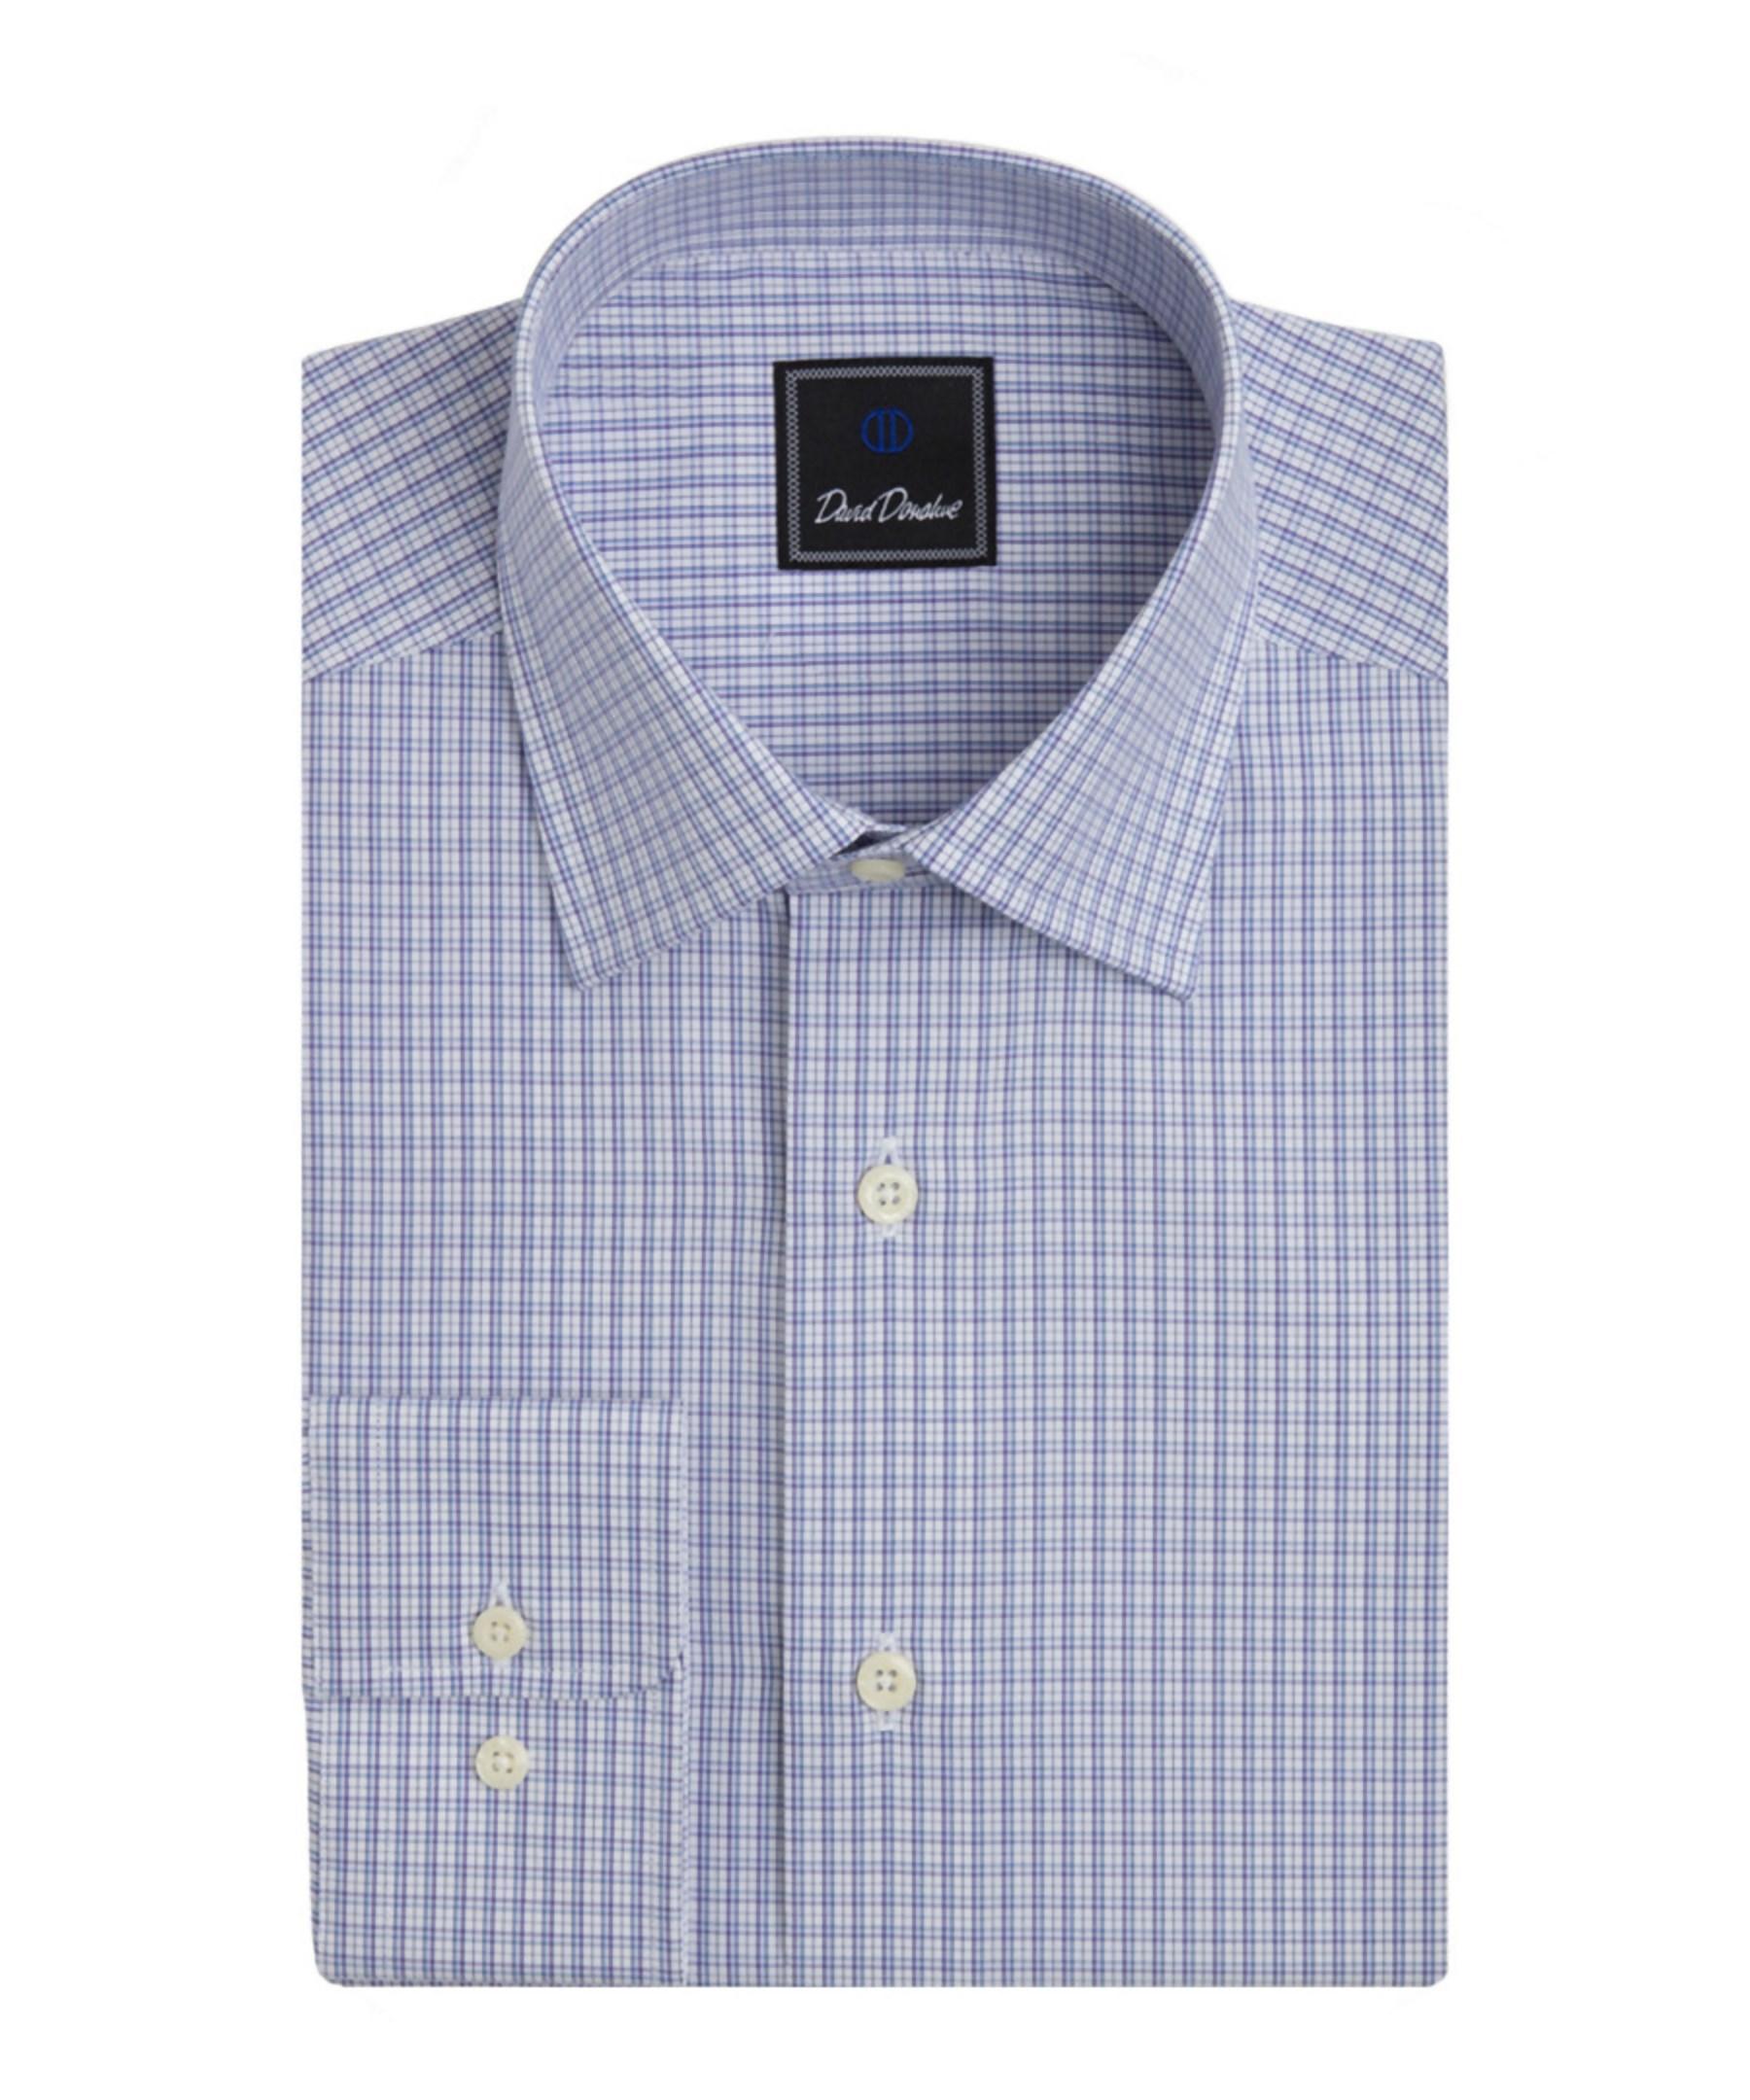 David Donahue Regular Fit Dress Shirt In Blue For Men Lyst